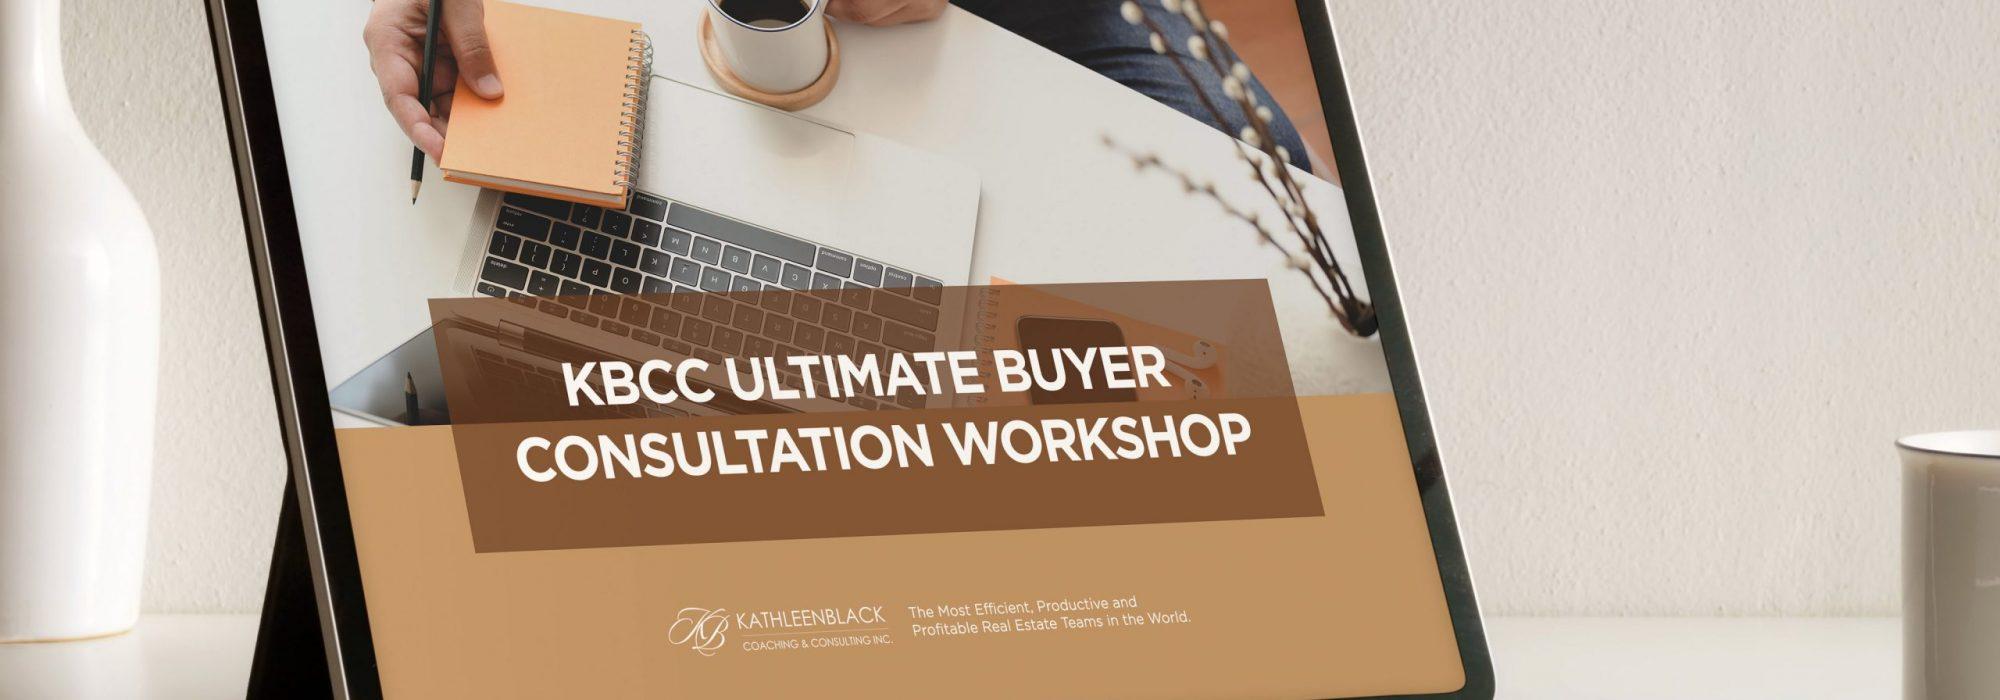 kbcc-ultimate-buyer-consultation-workshop